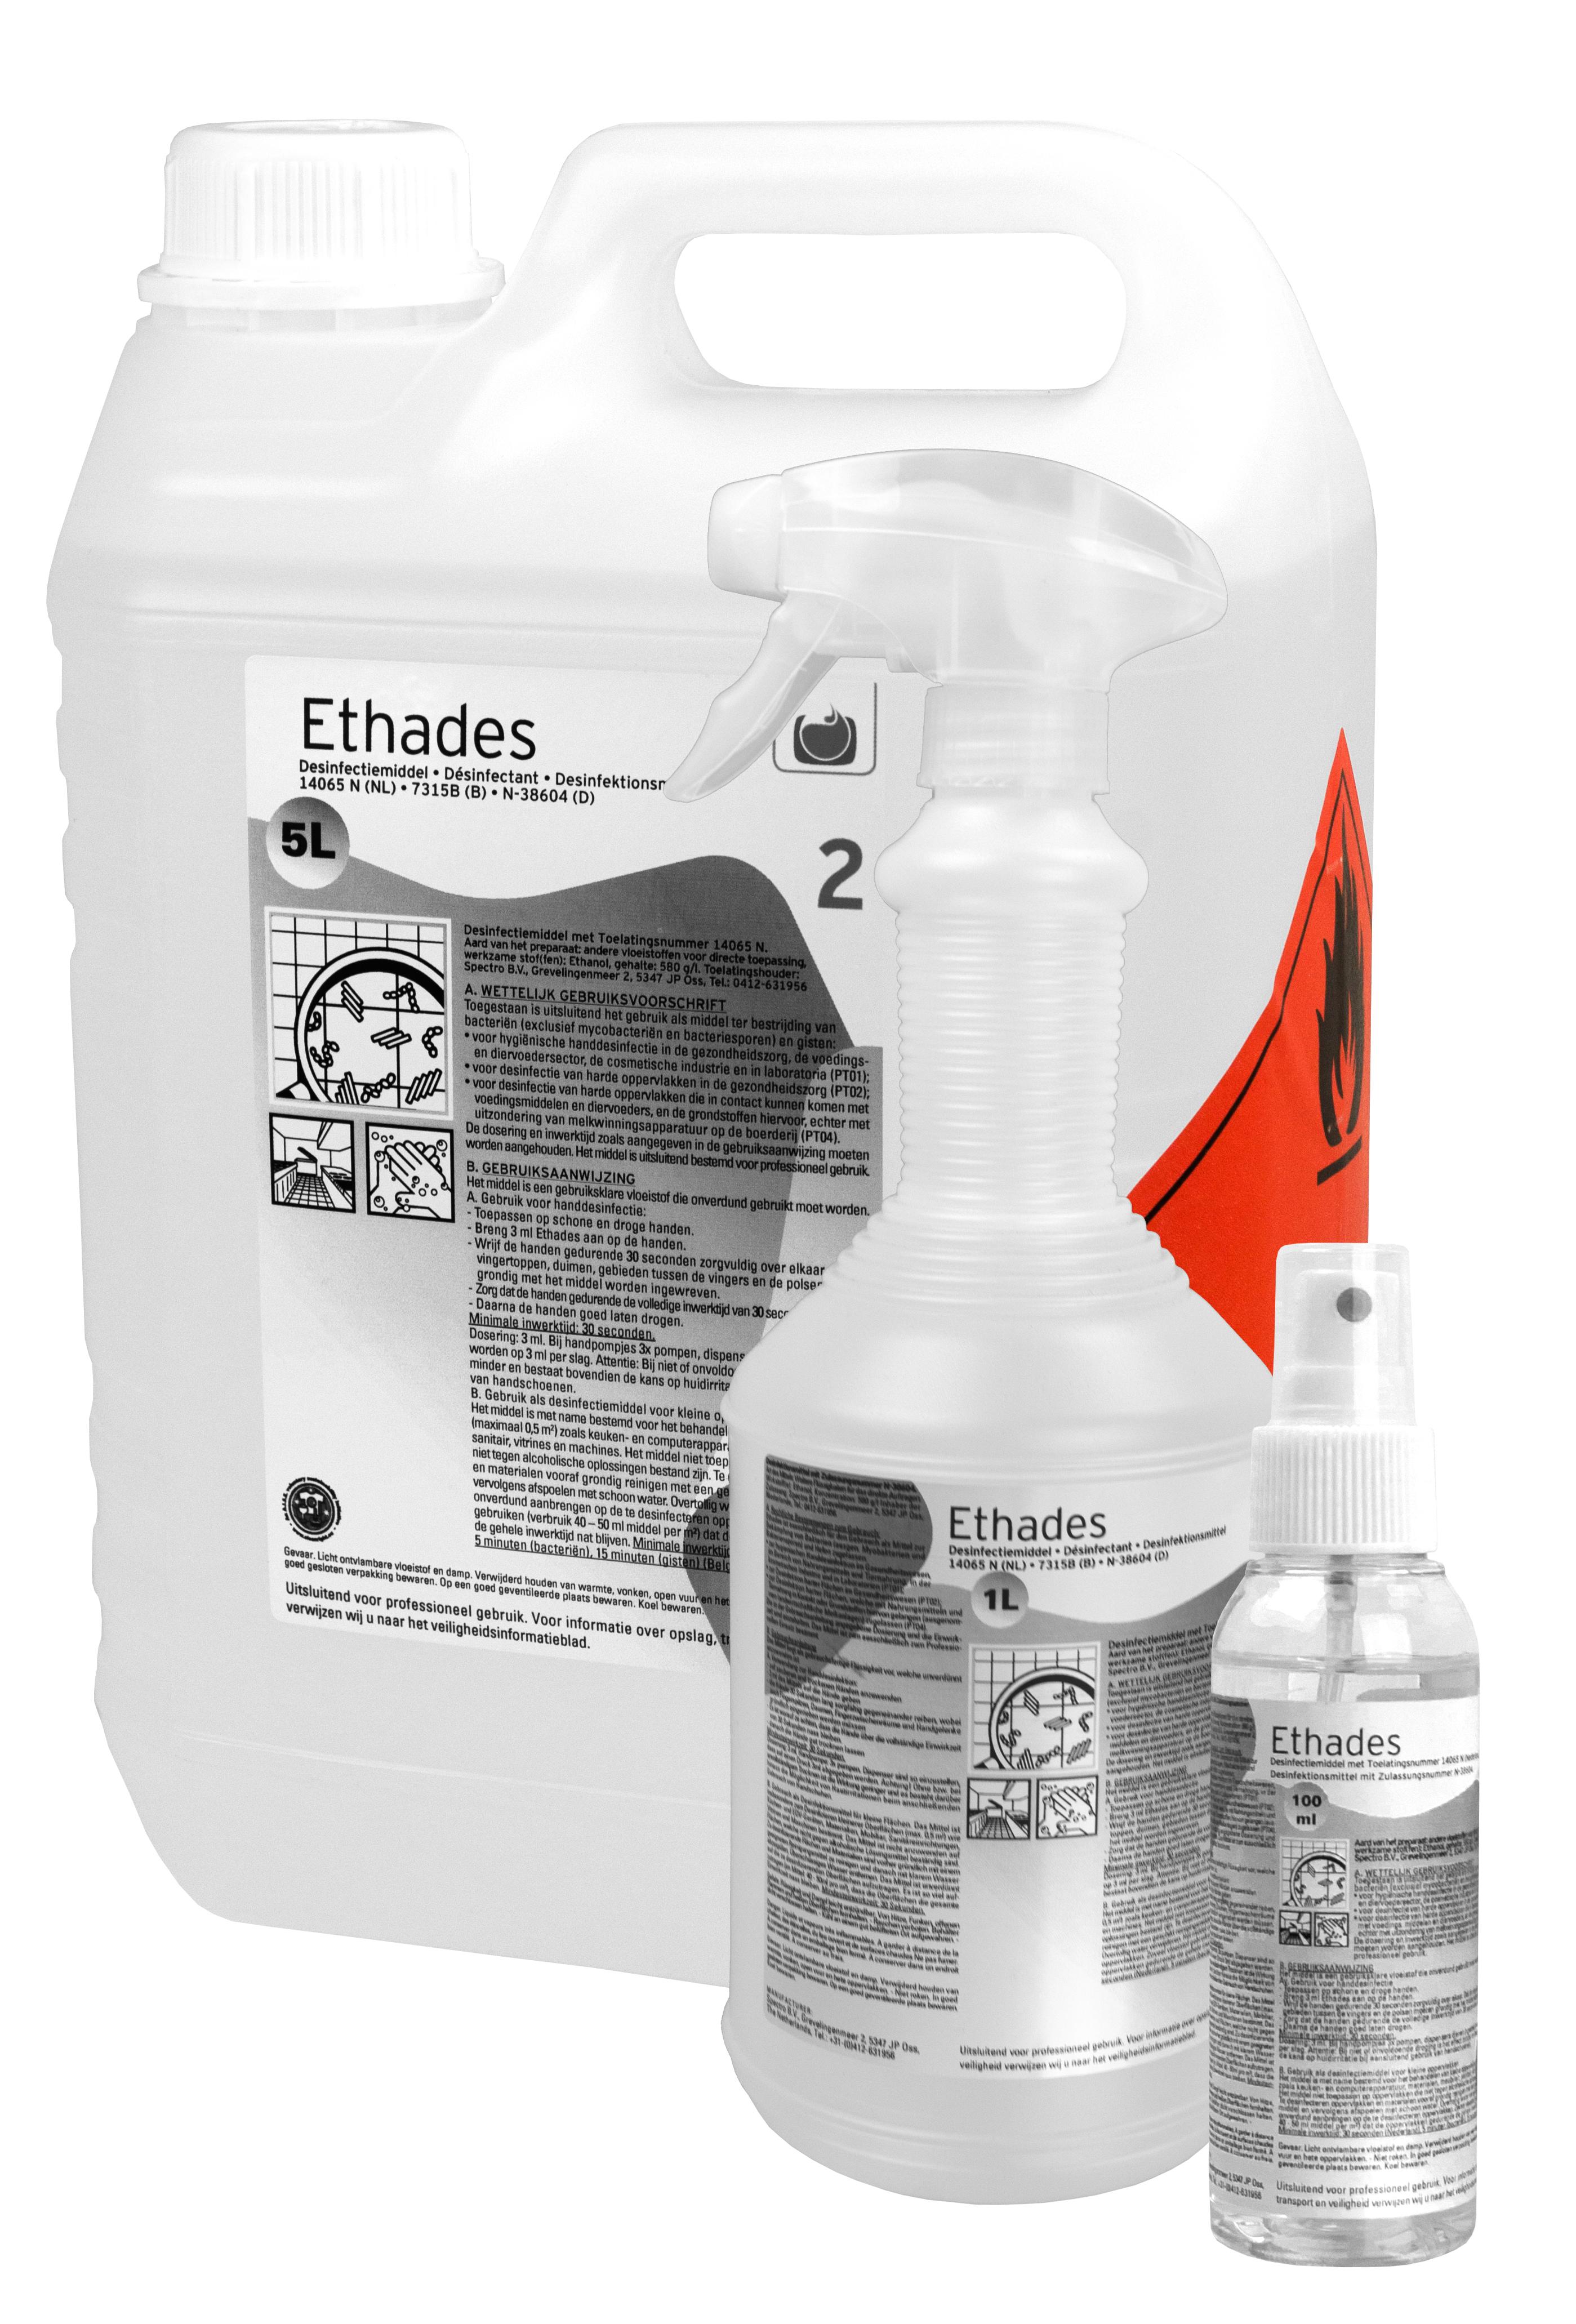 Ethades desinfectant 5 liter